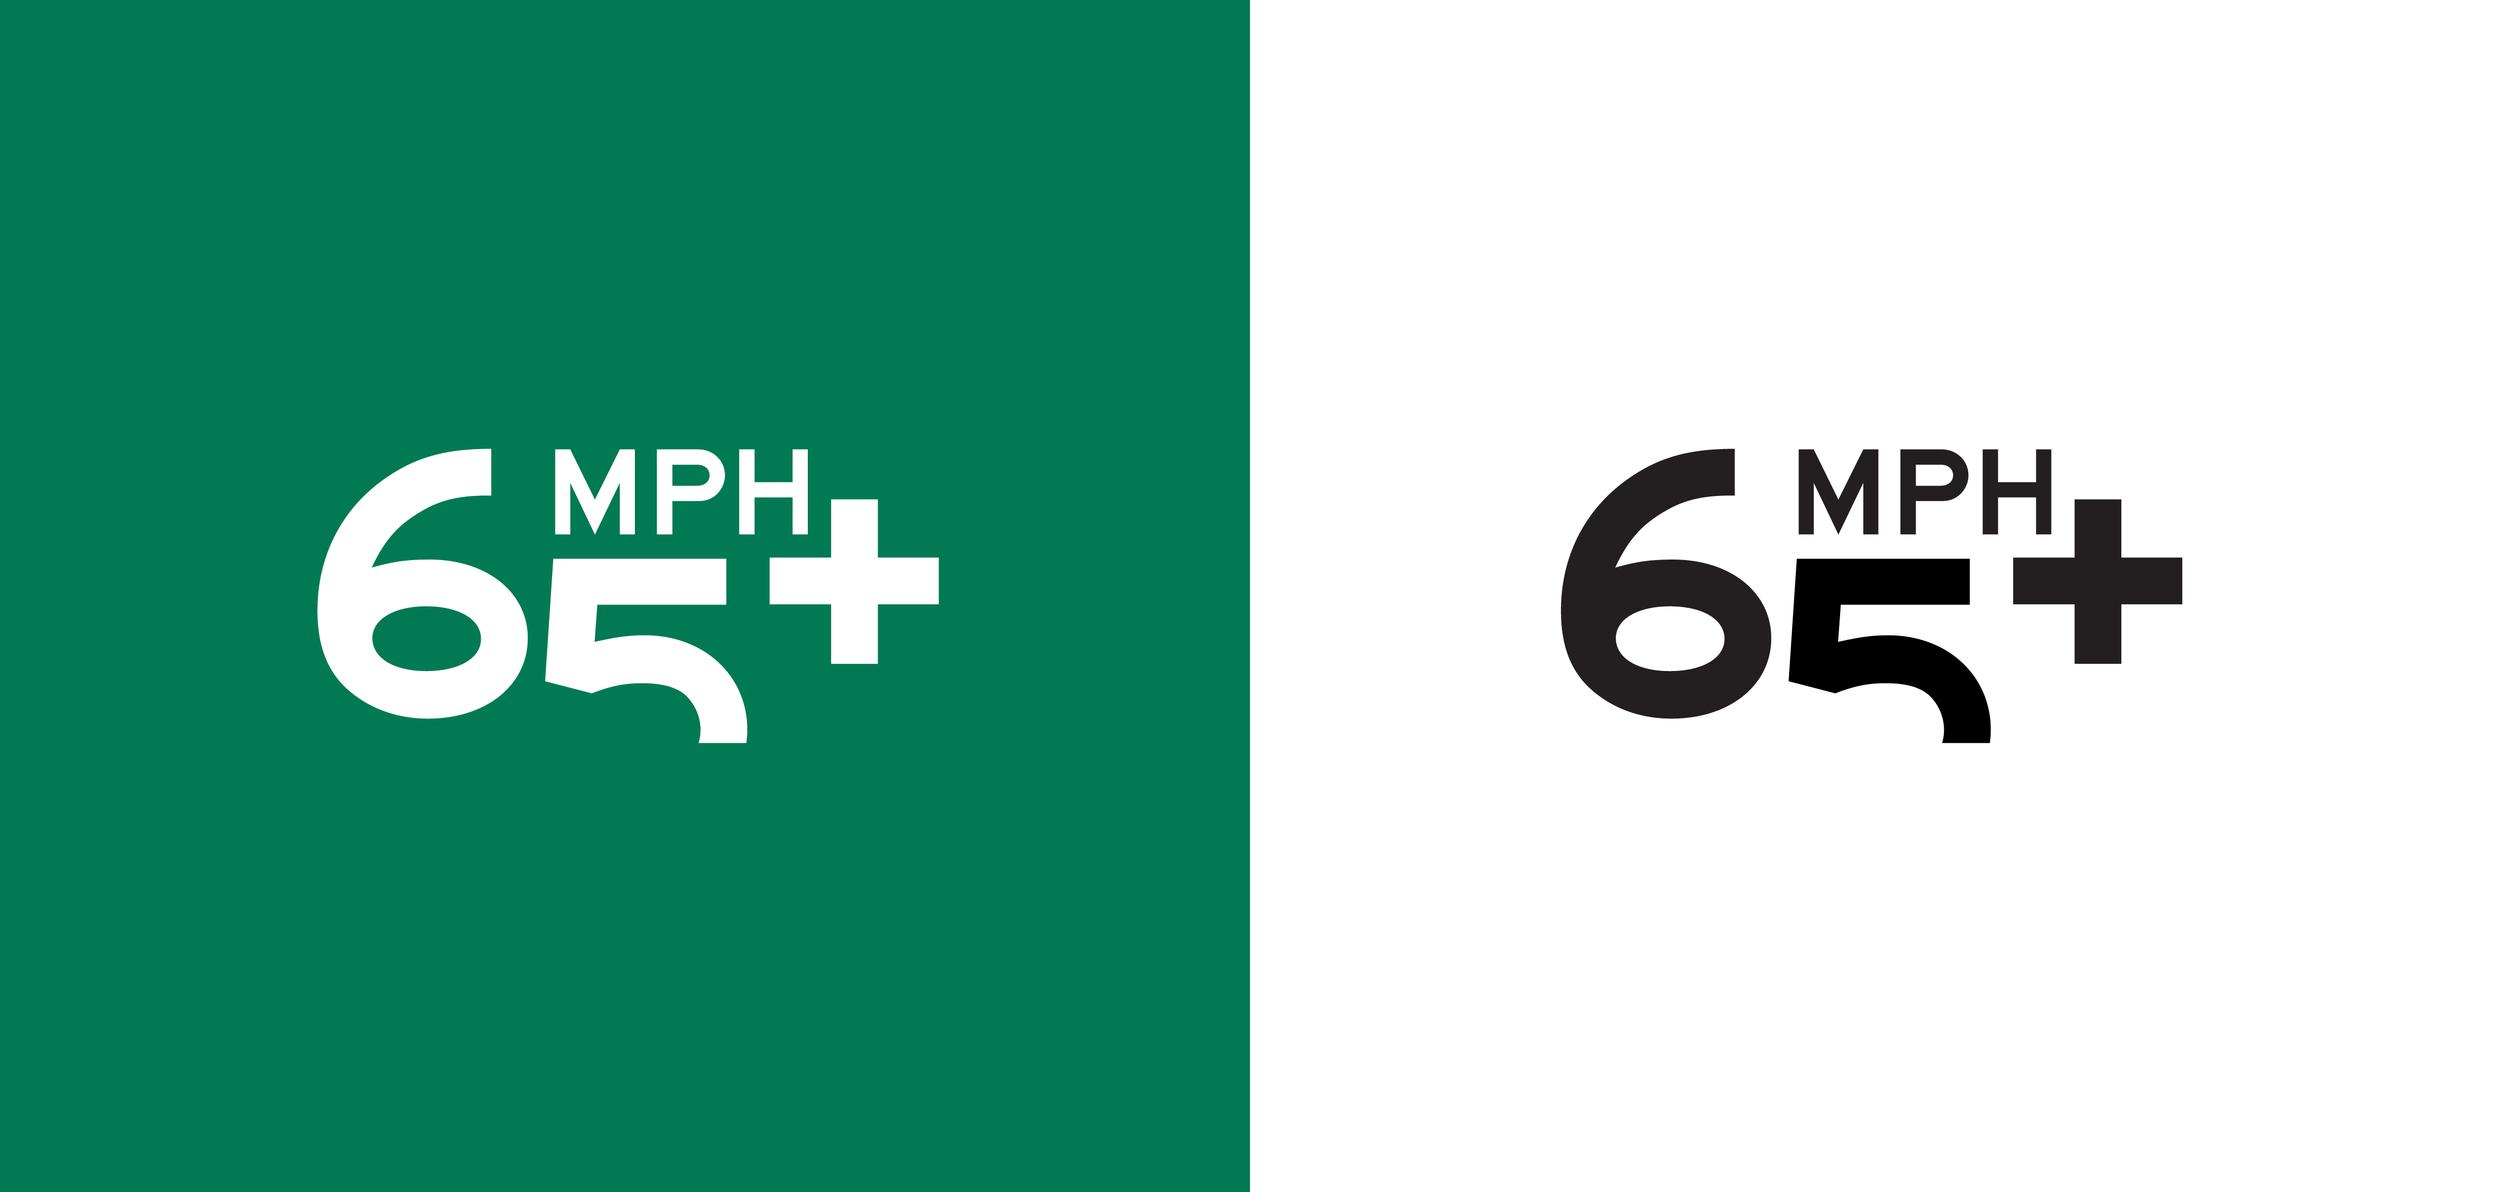 65mph-logo-integrity-01.png